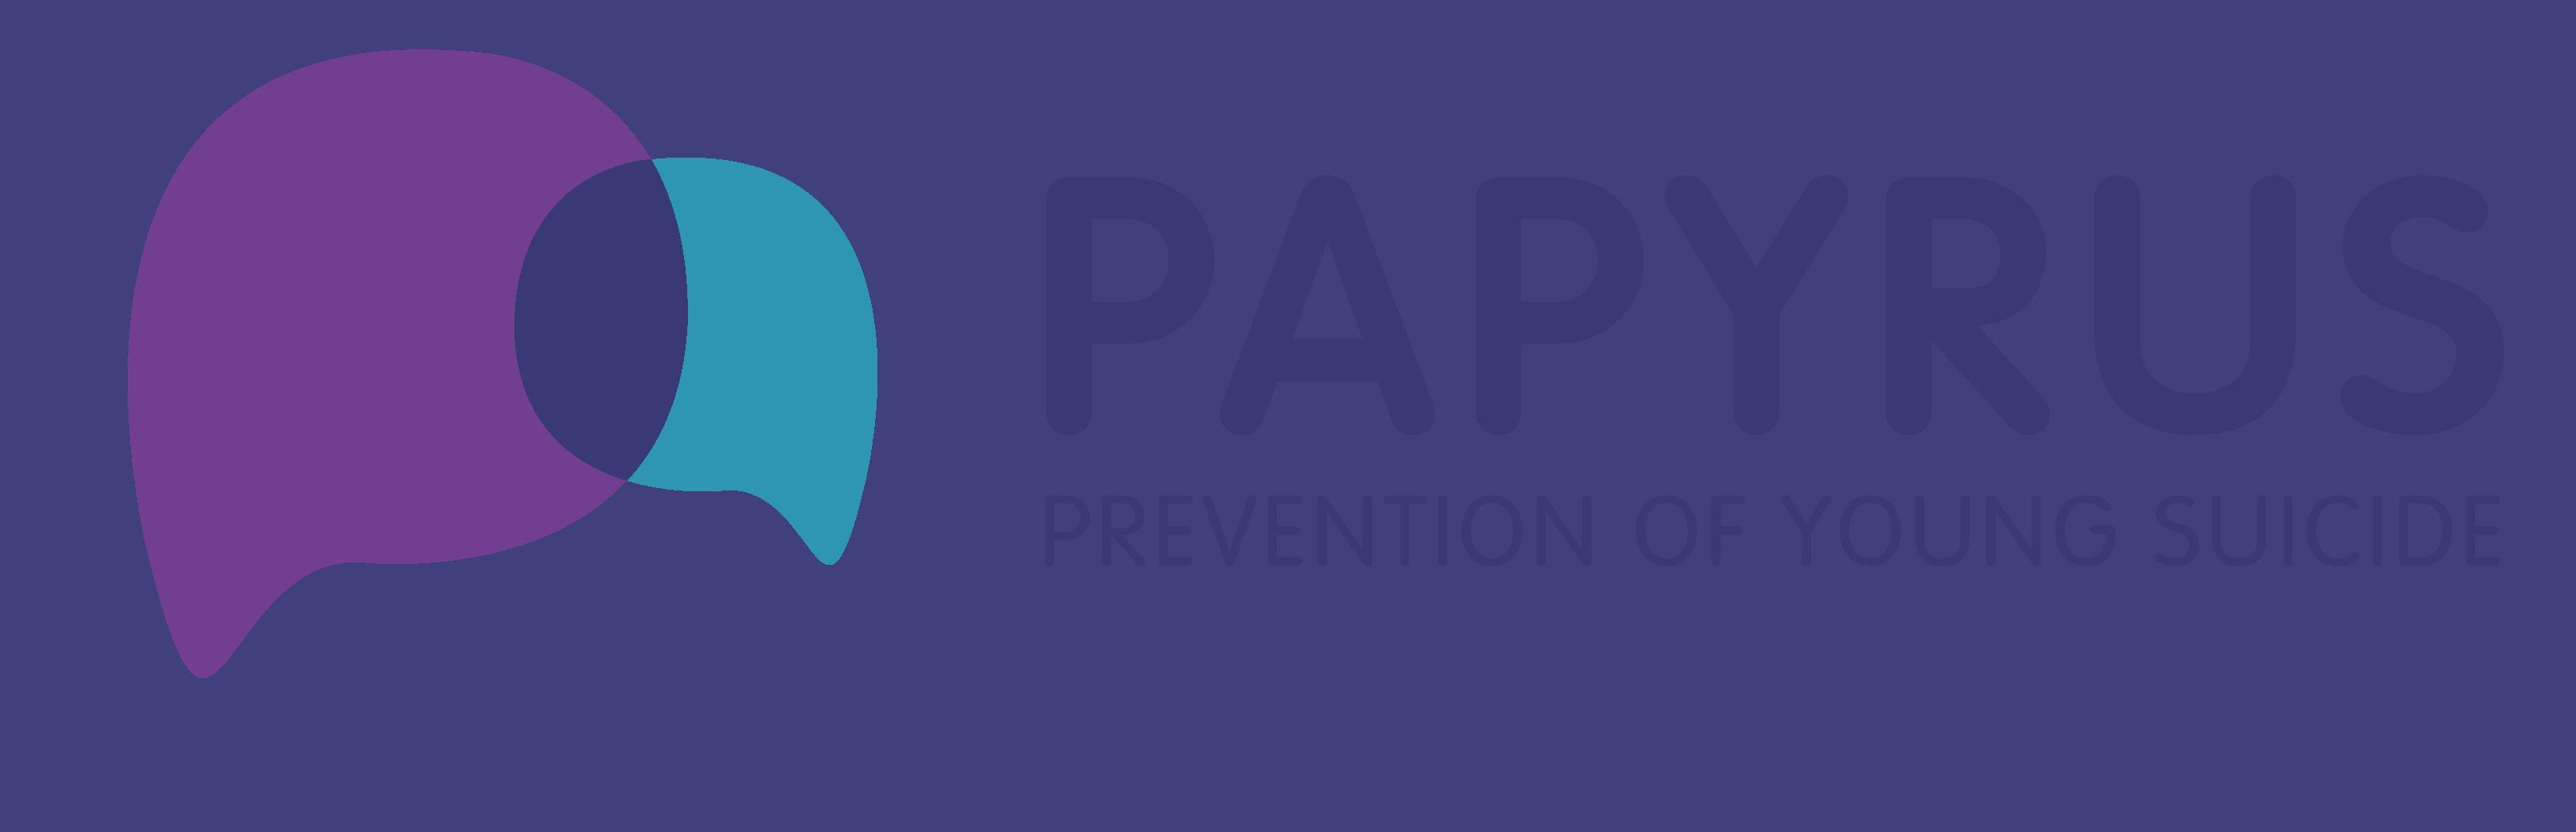 PAPYRUS-logo